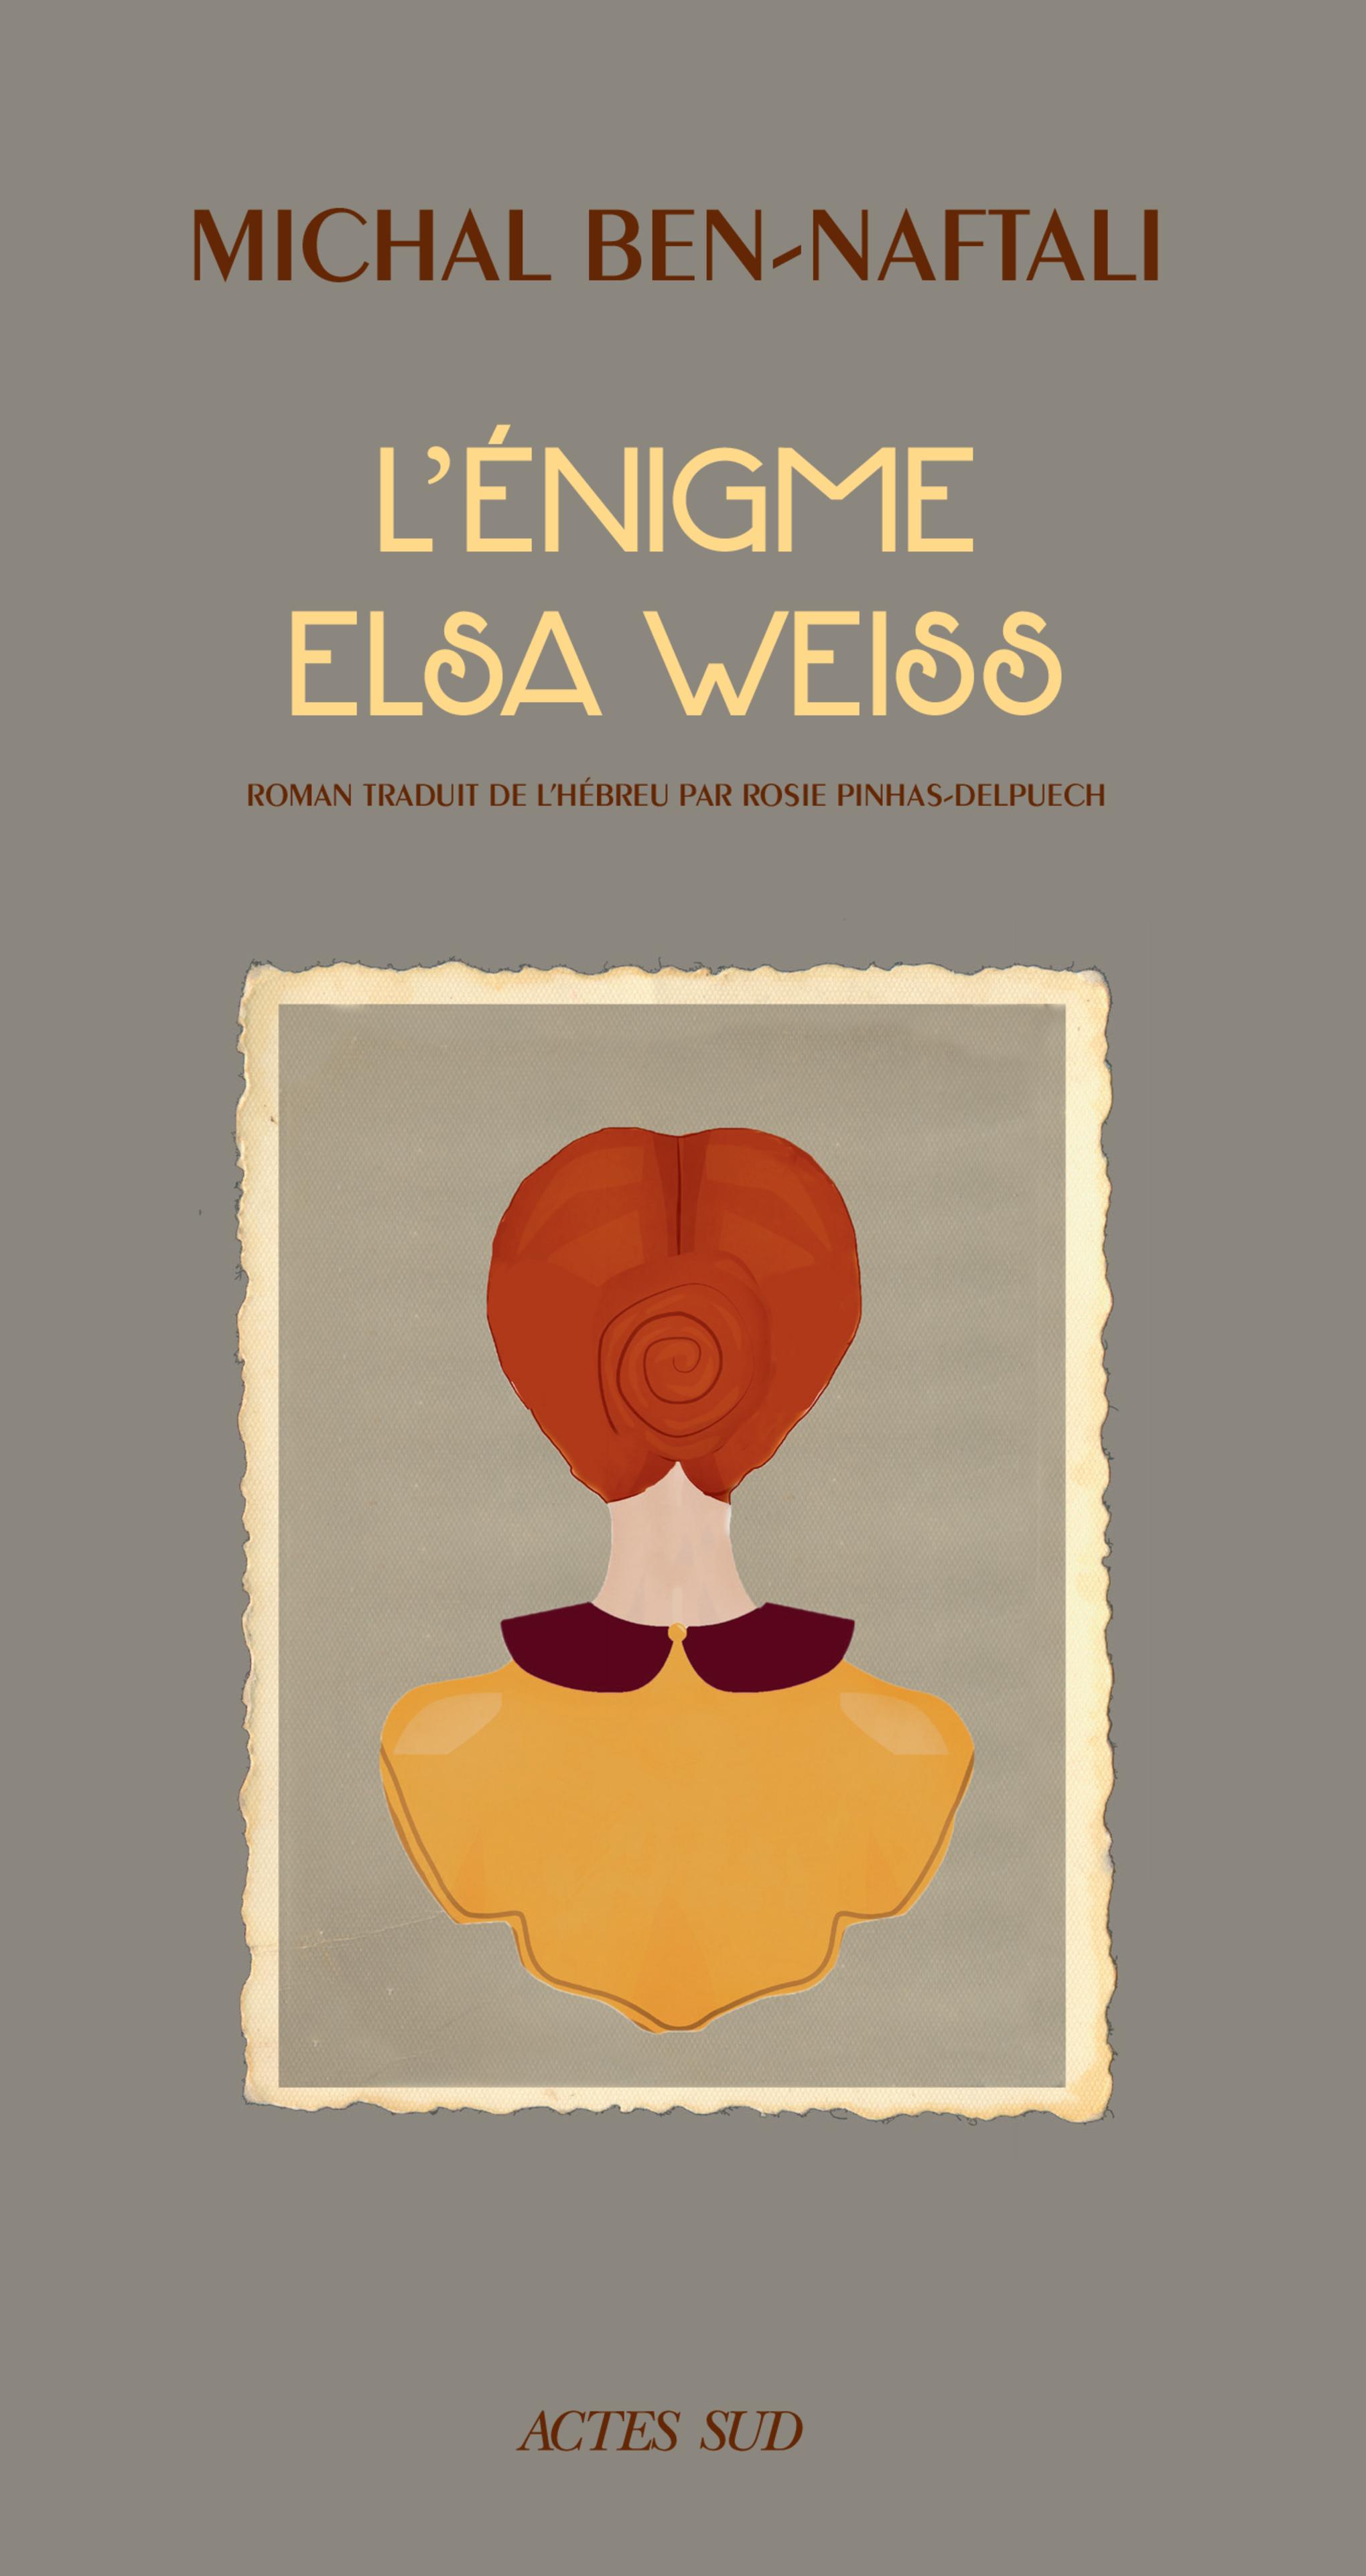 L'ENIGME ELSA WEISS